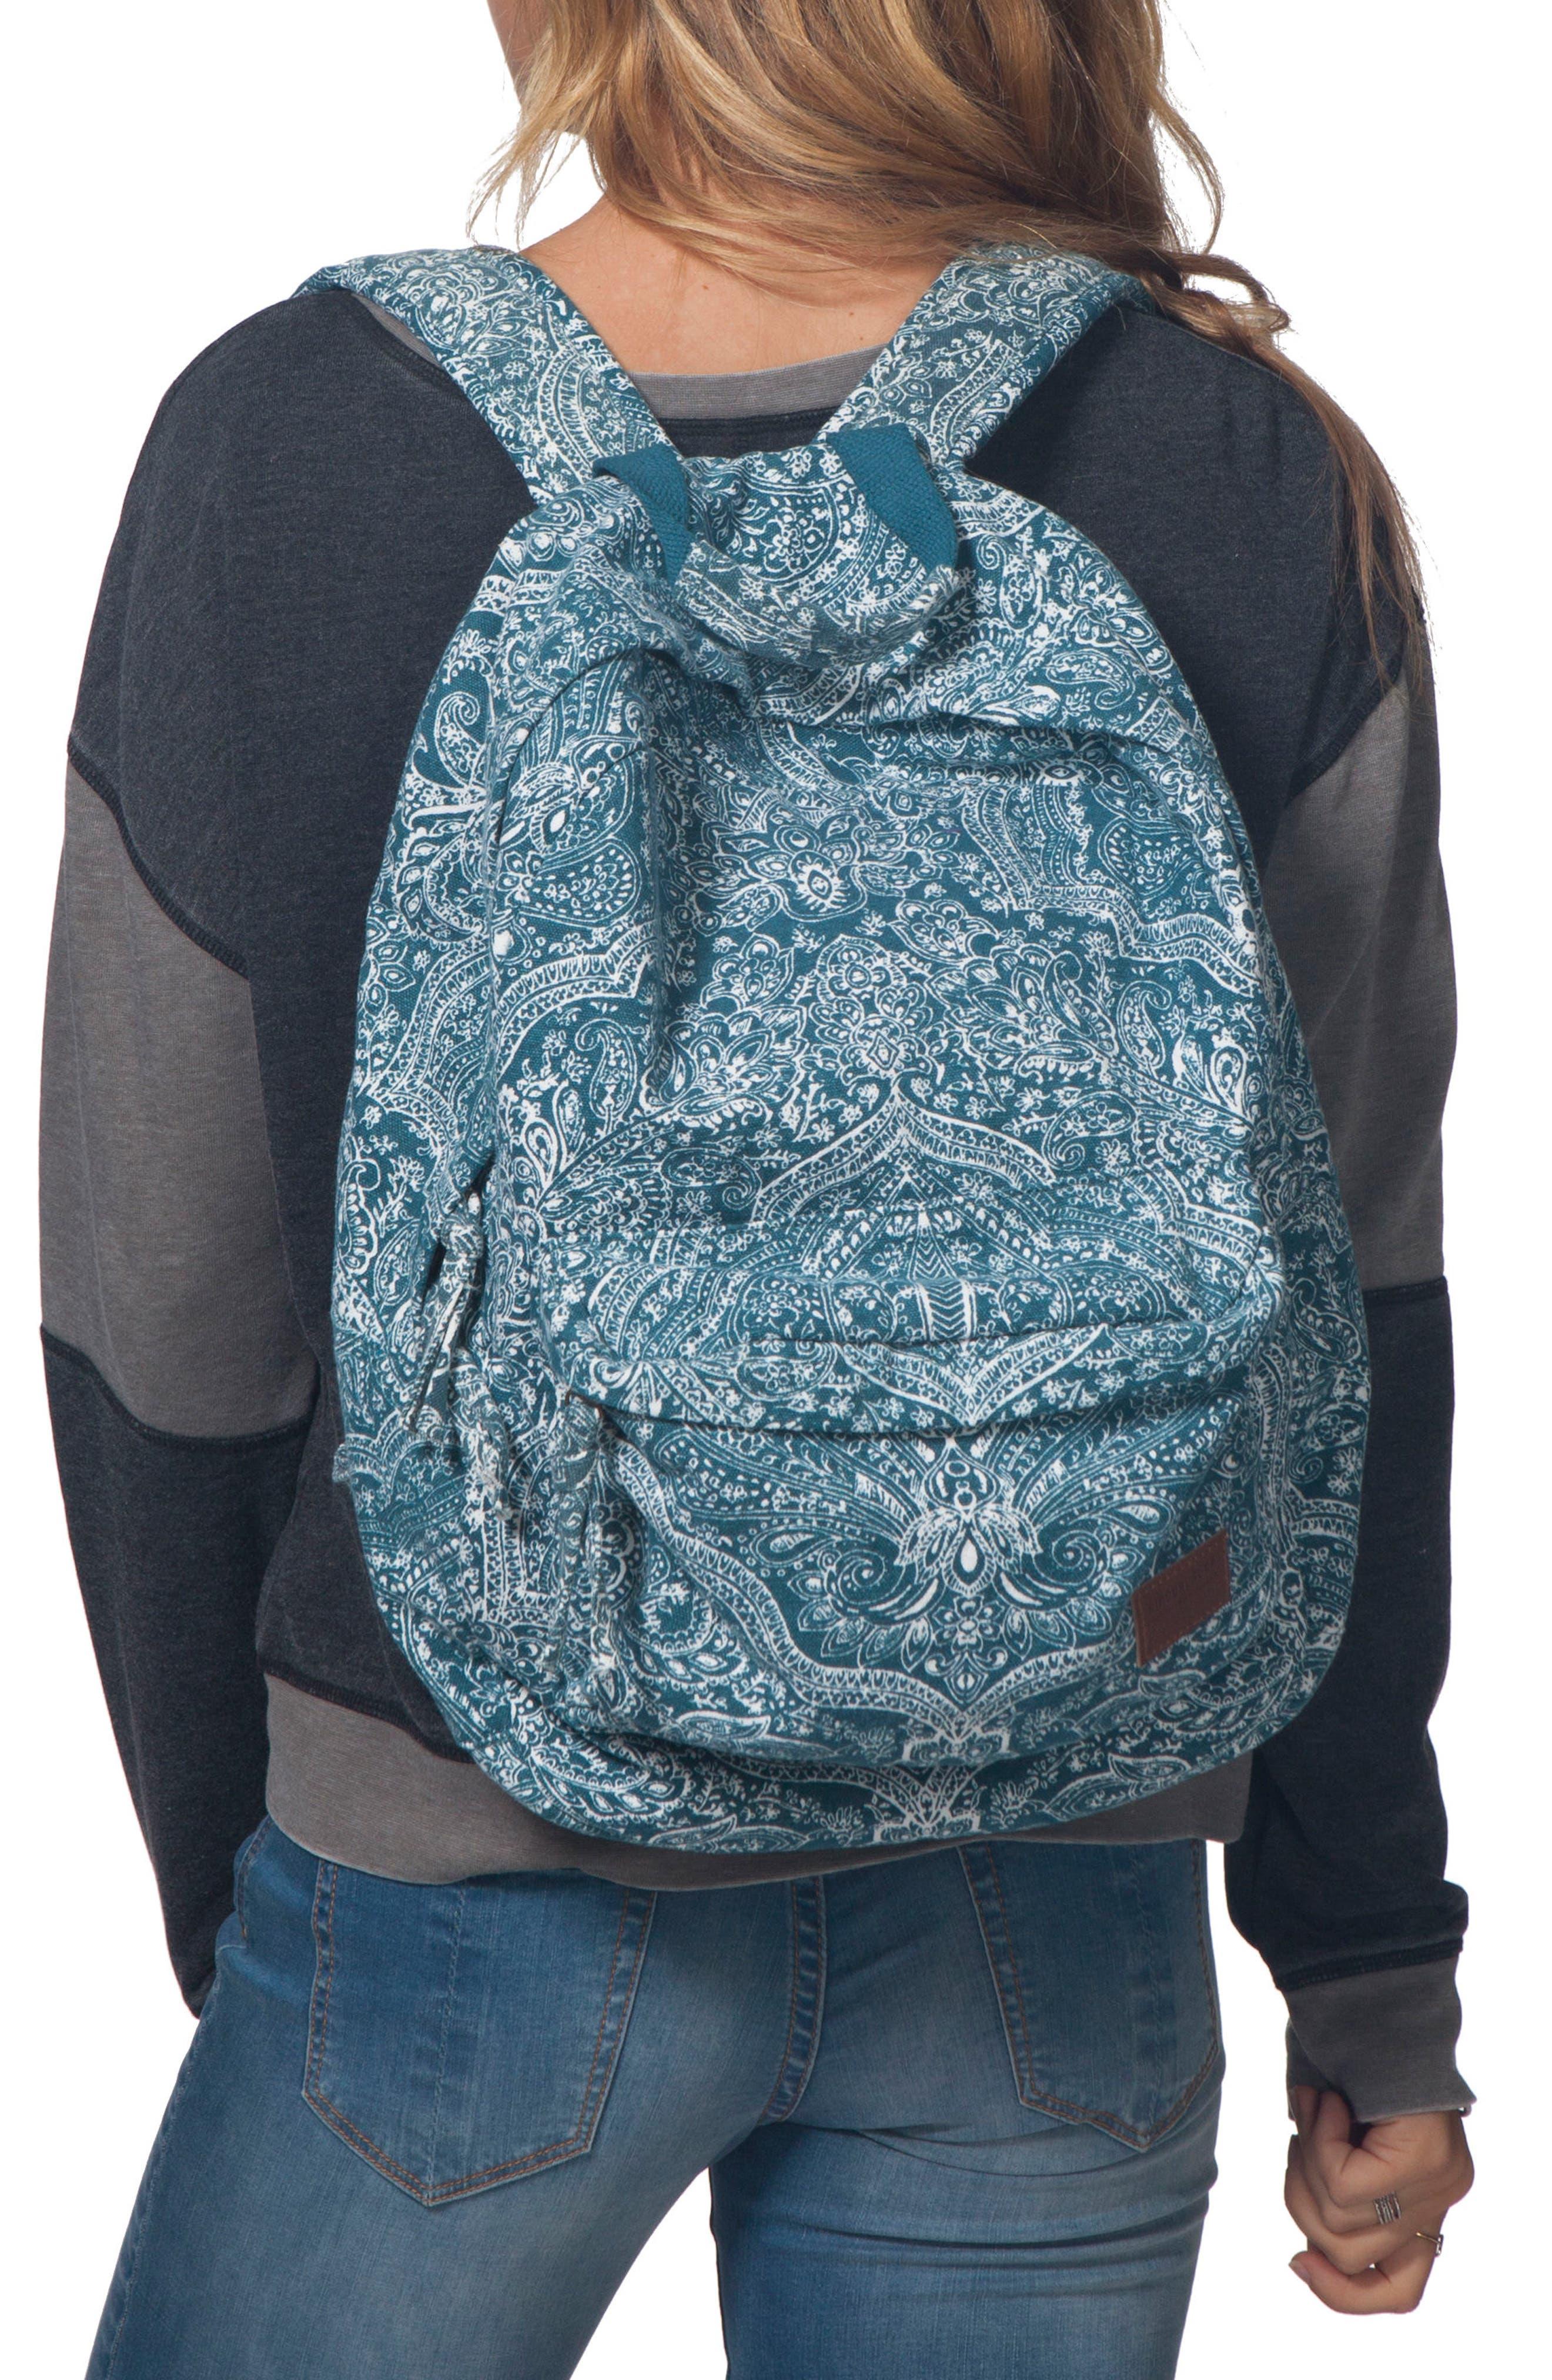 Everglow Backpack,                             Main thumbnail 1, color,                             440